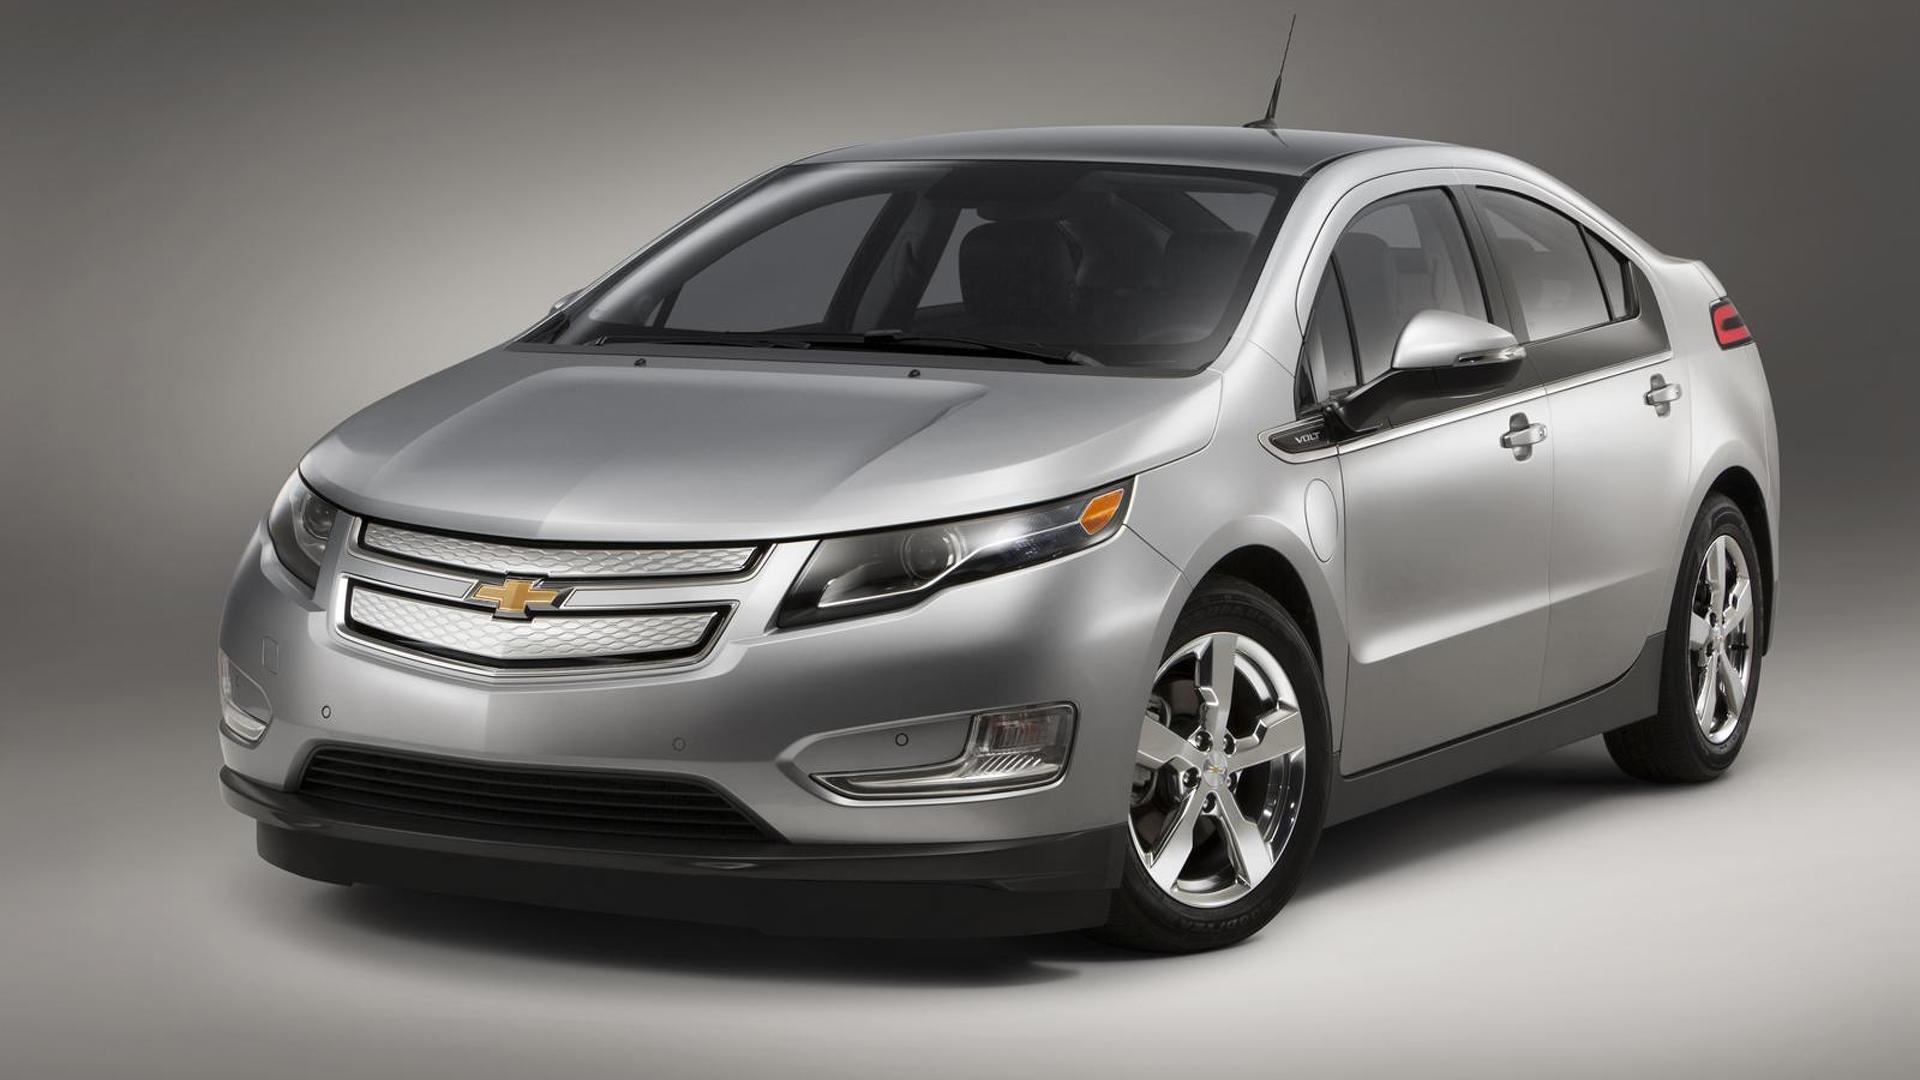 GM plotting Tesla Model S competitor with 200-mile range - report